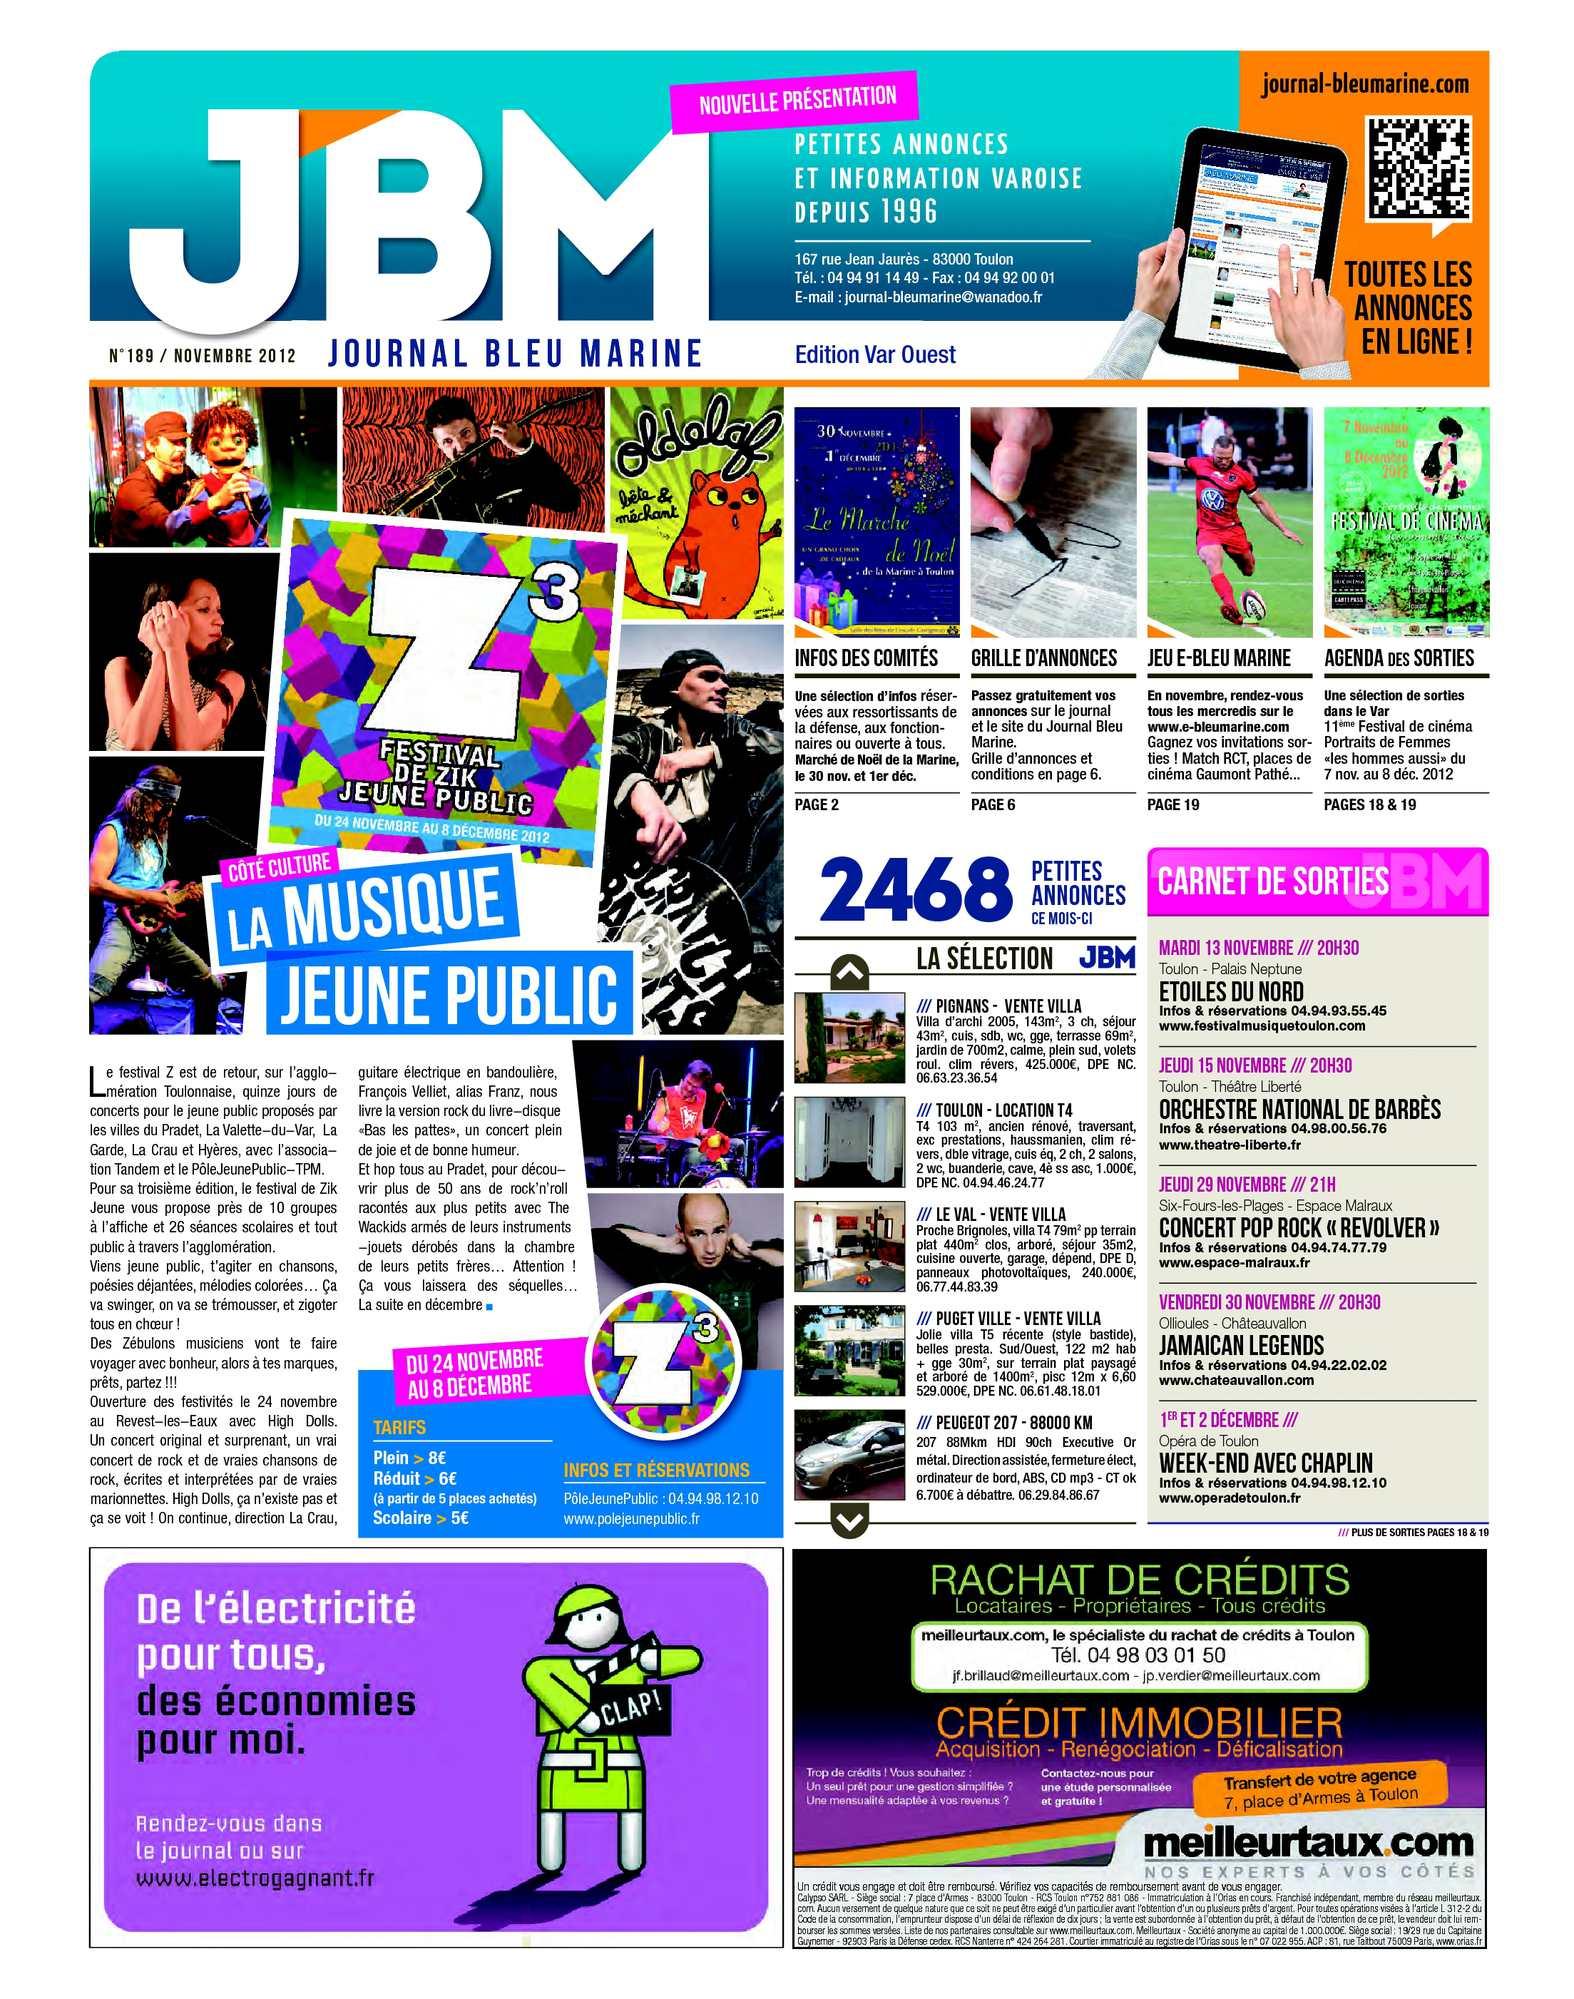 Calaméo Journal Bleu Marine n°189 Novembre 2012